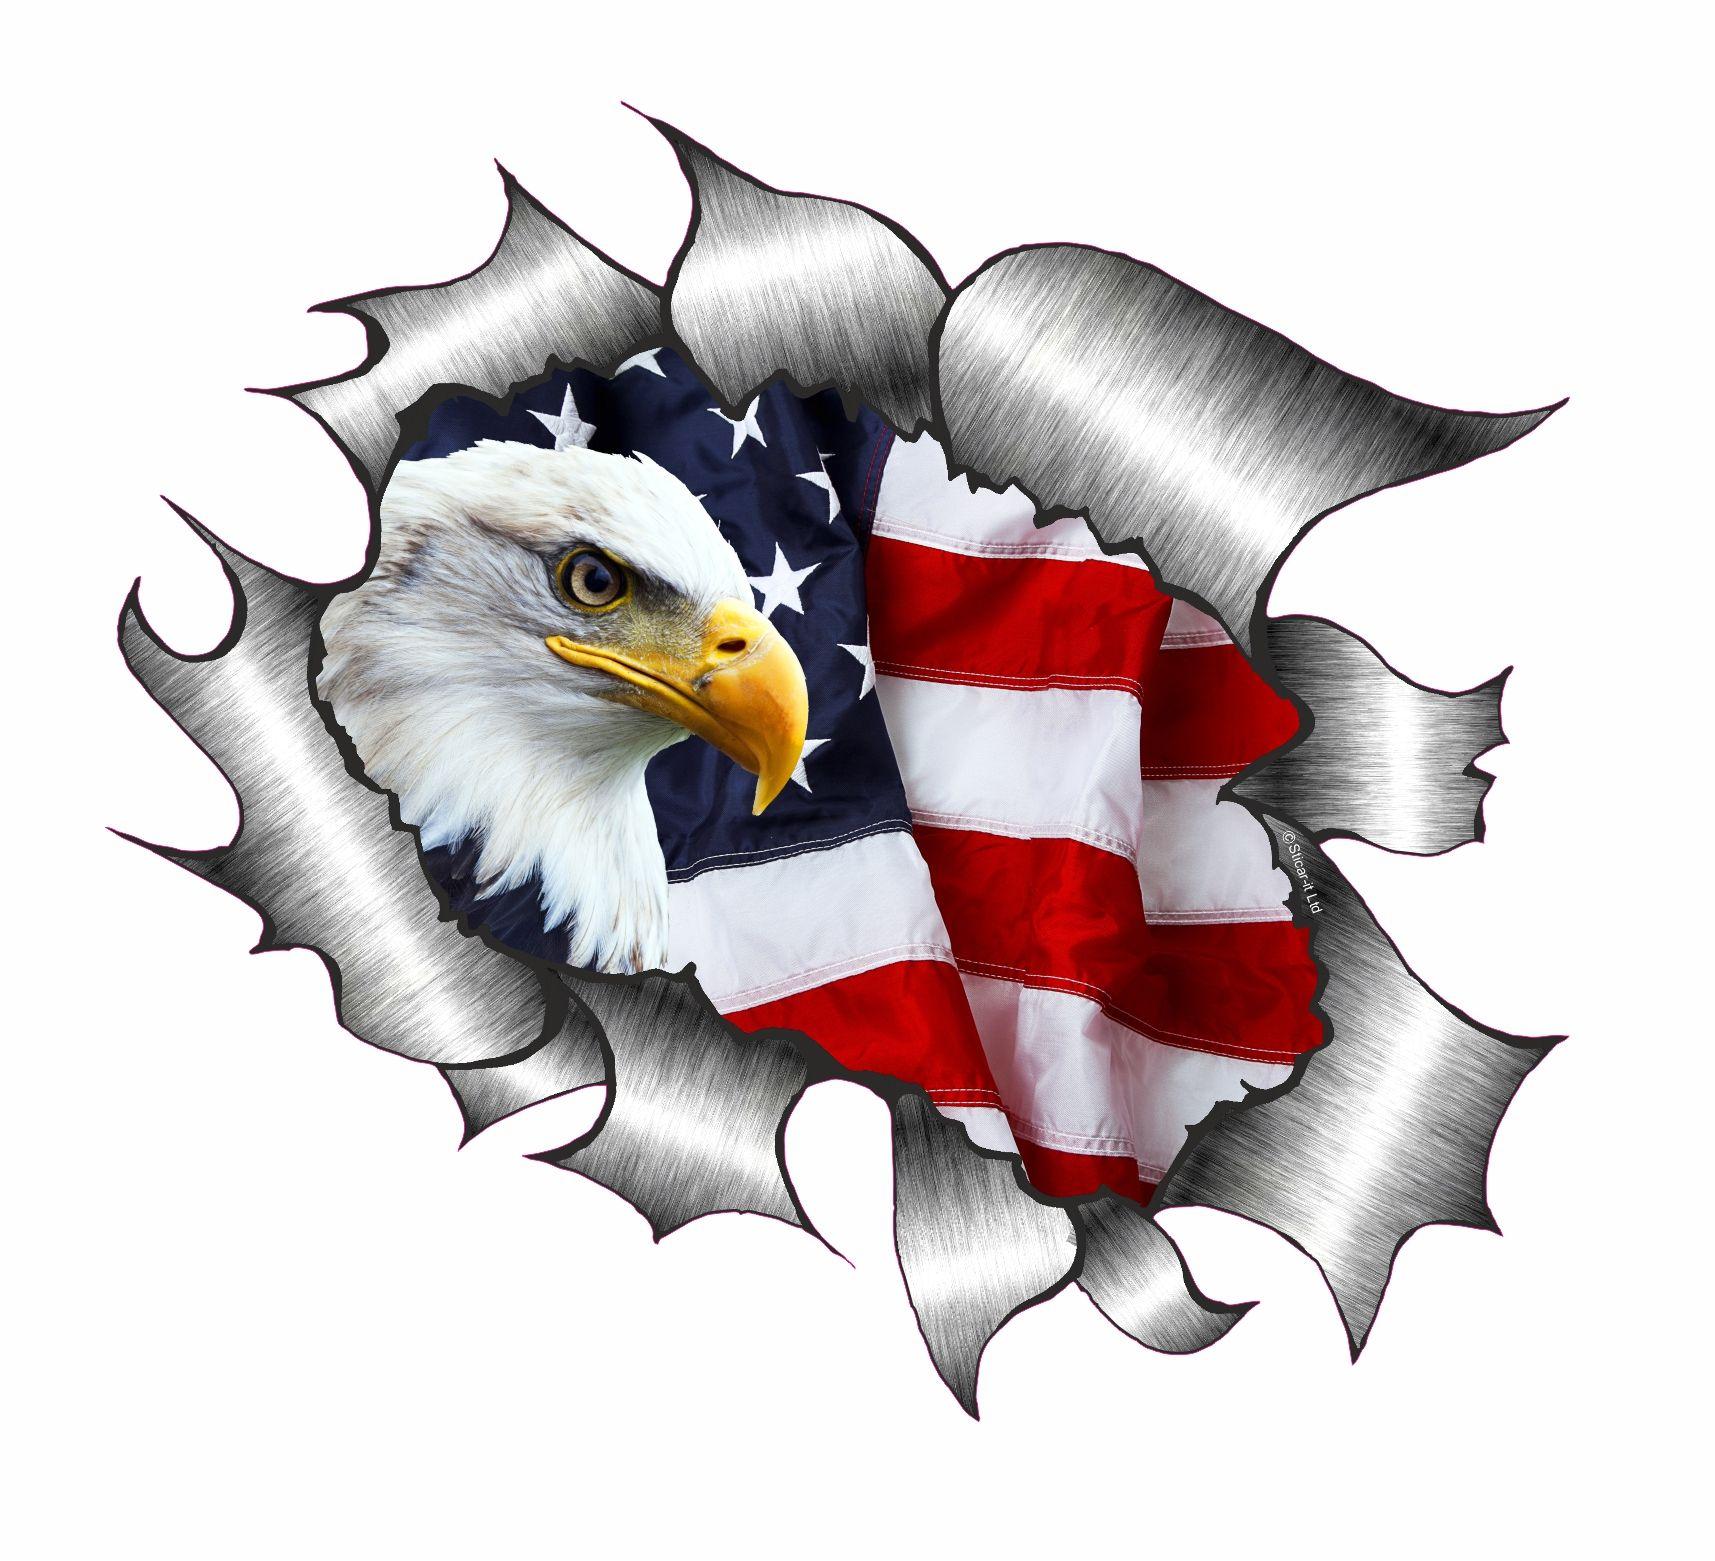 Ripped Torn Metal Design With American Bald Eagle & US Flag Motif External  Vinyl Car Sticker 105x130mm